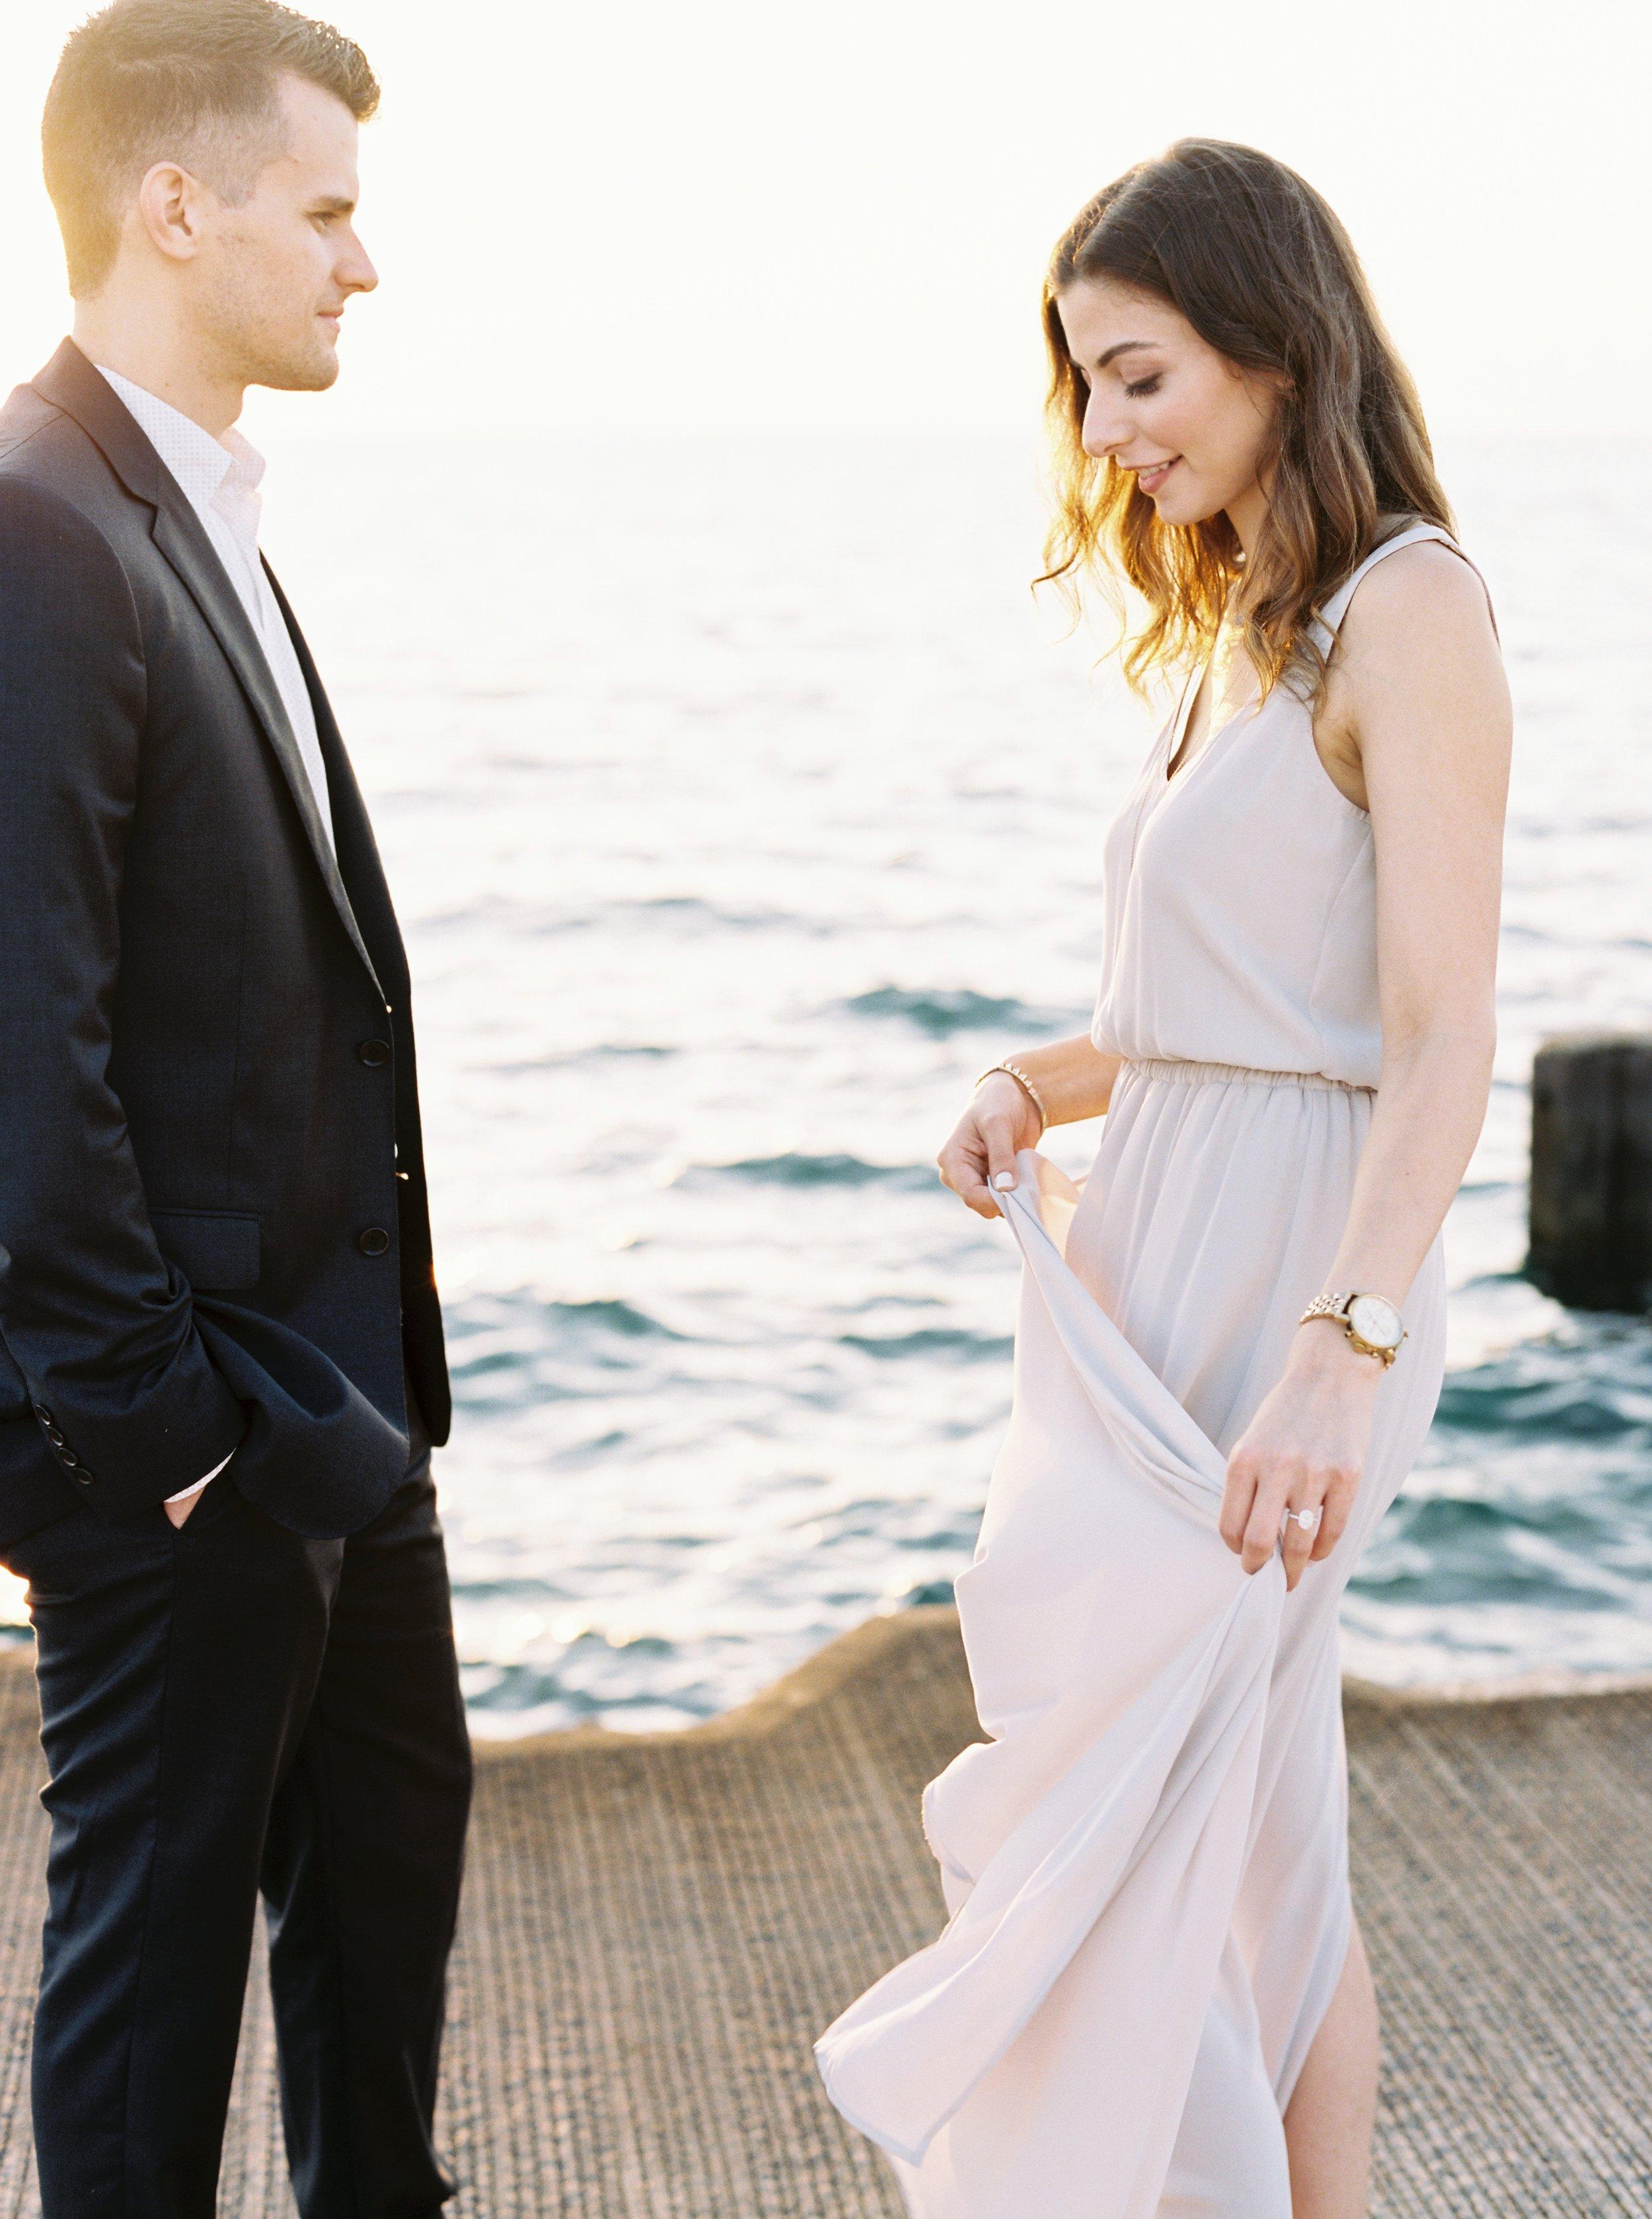 Kyle John l Fine Art Wedding Photography l Chicago, Copenhagen, California, New York, Destination l Blog l Nathalie and Colby_Lake Michigan_Sunrise Engagement_3